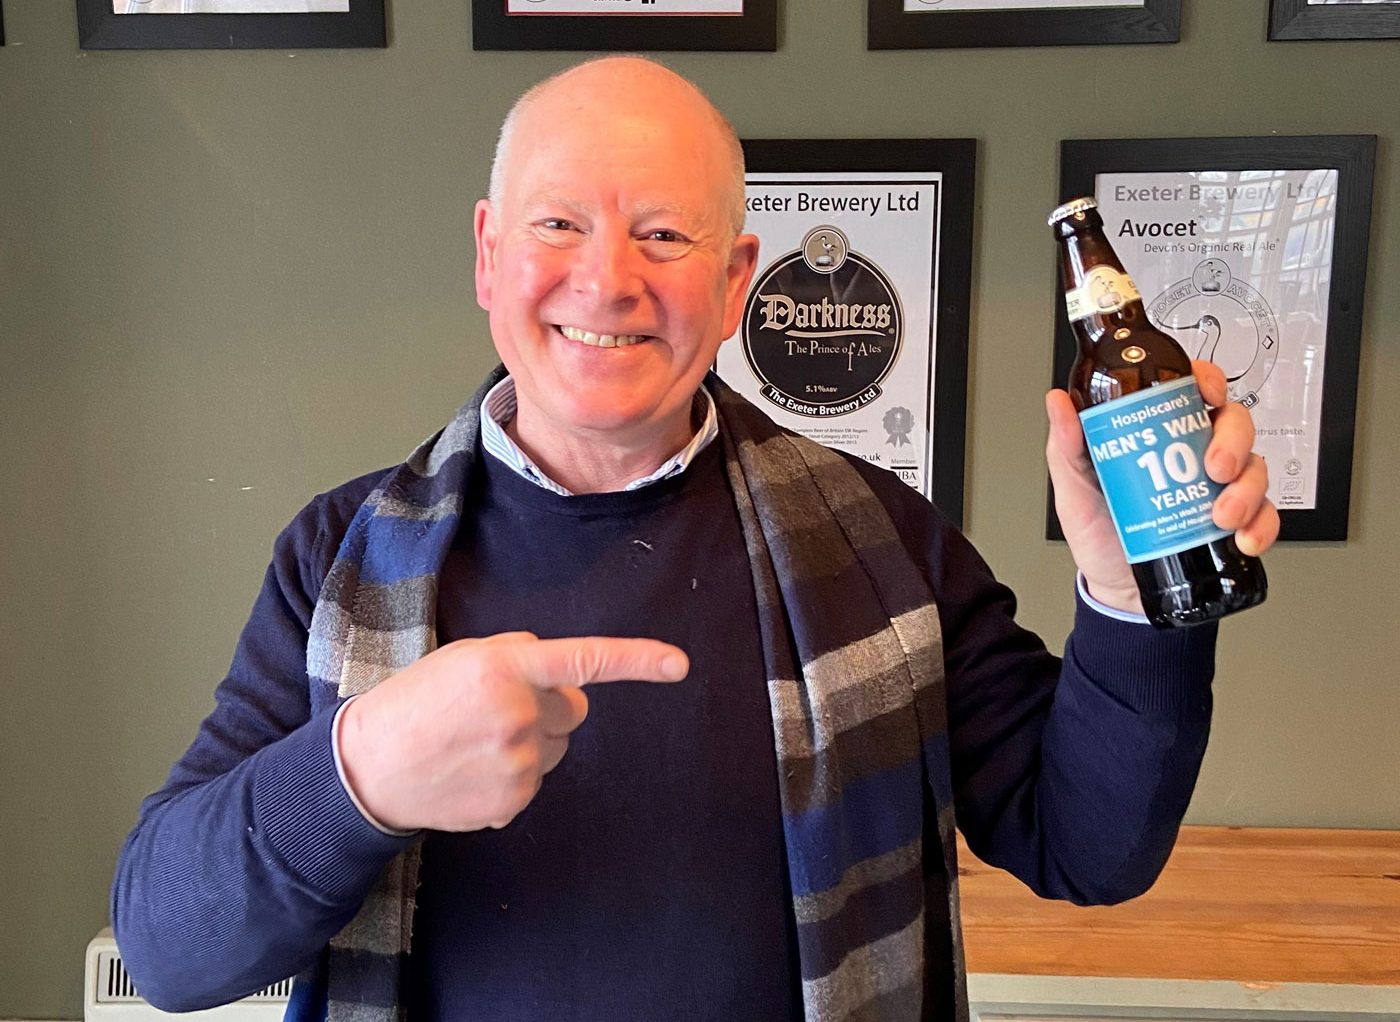 Cheers to ten years of Men's Walk with special anniversary beer